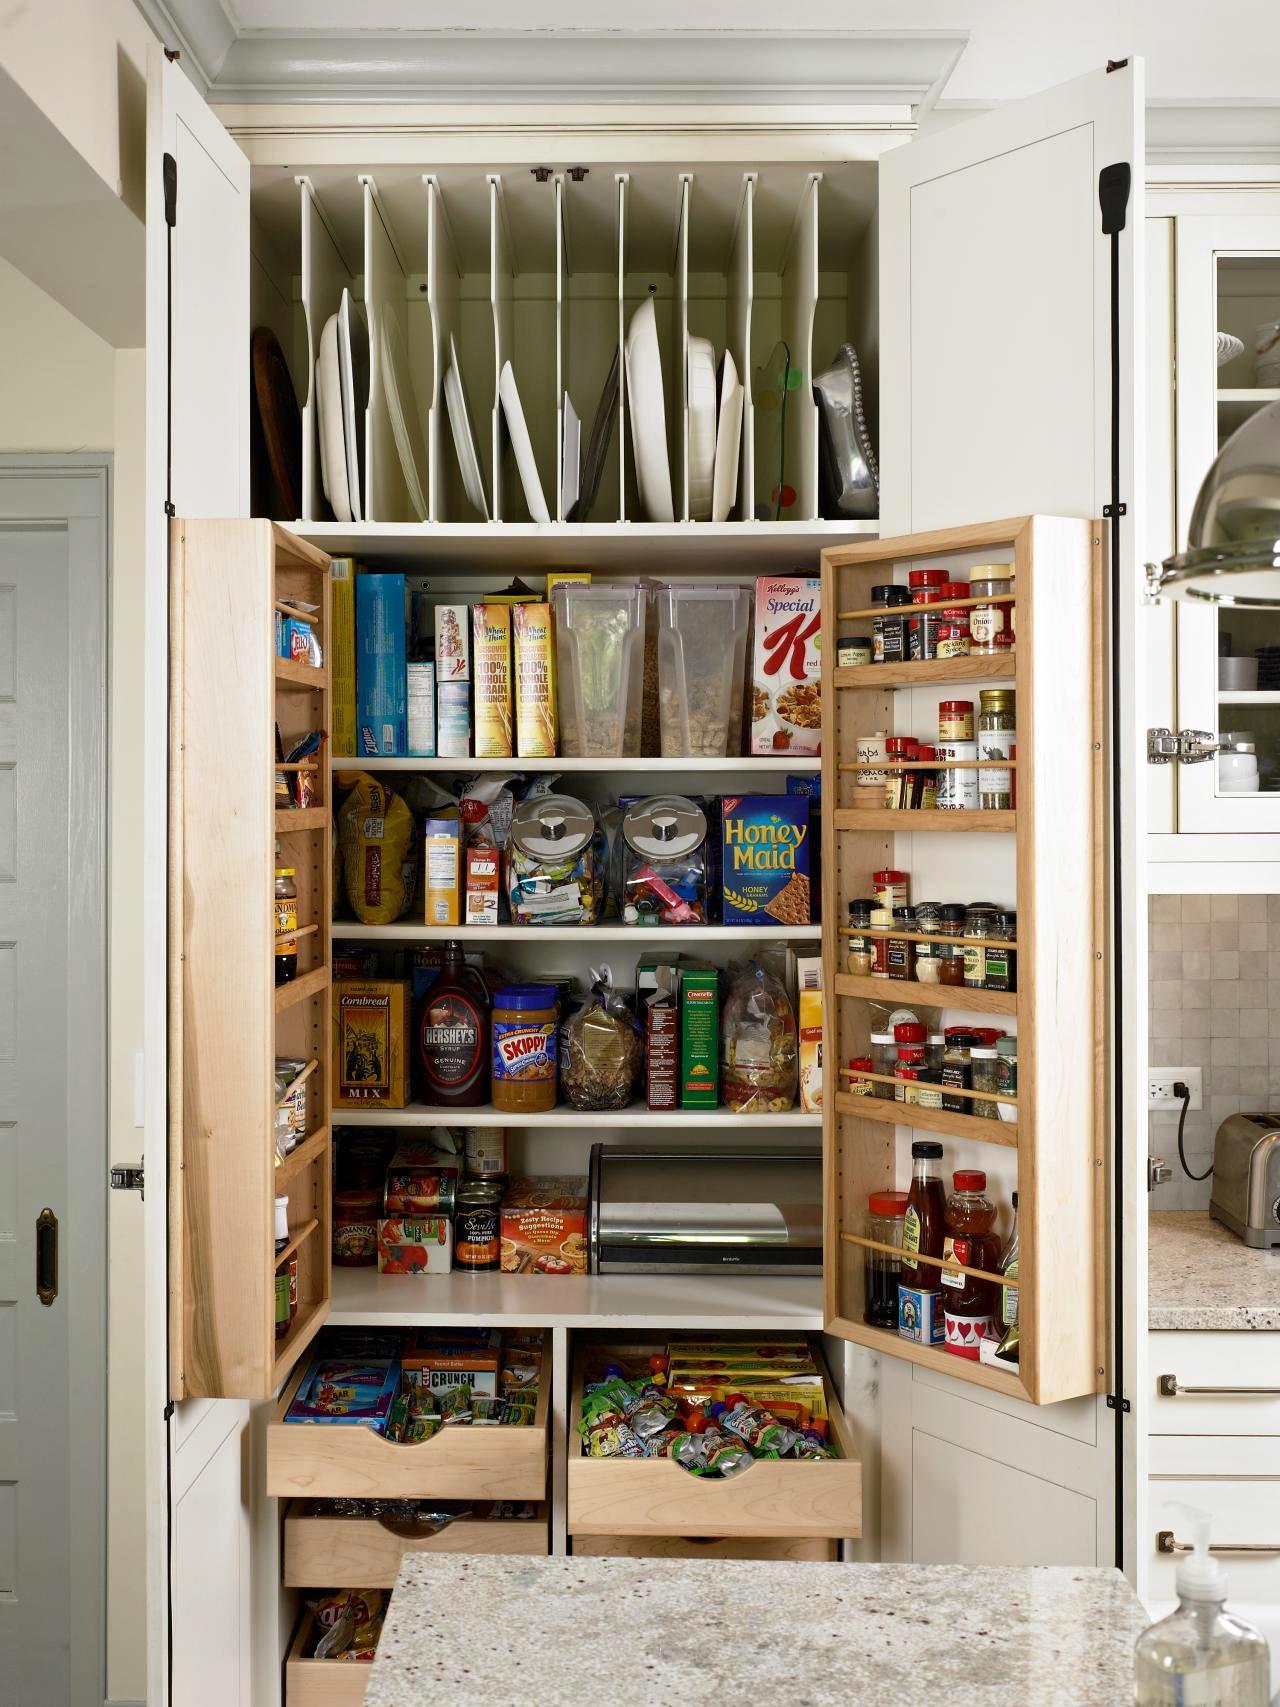 Small Spaces Storage Ideas Designs (1)